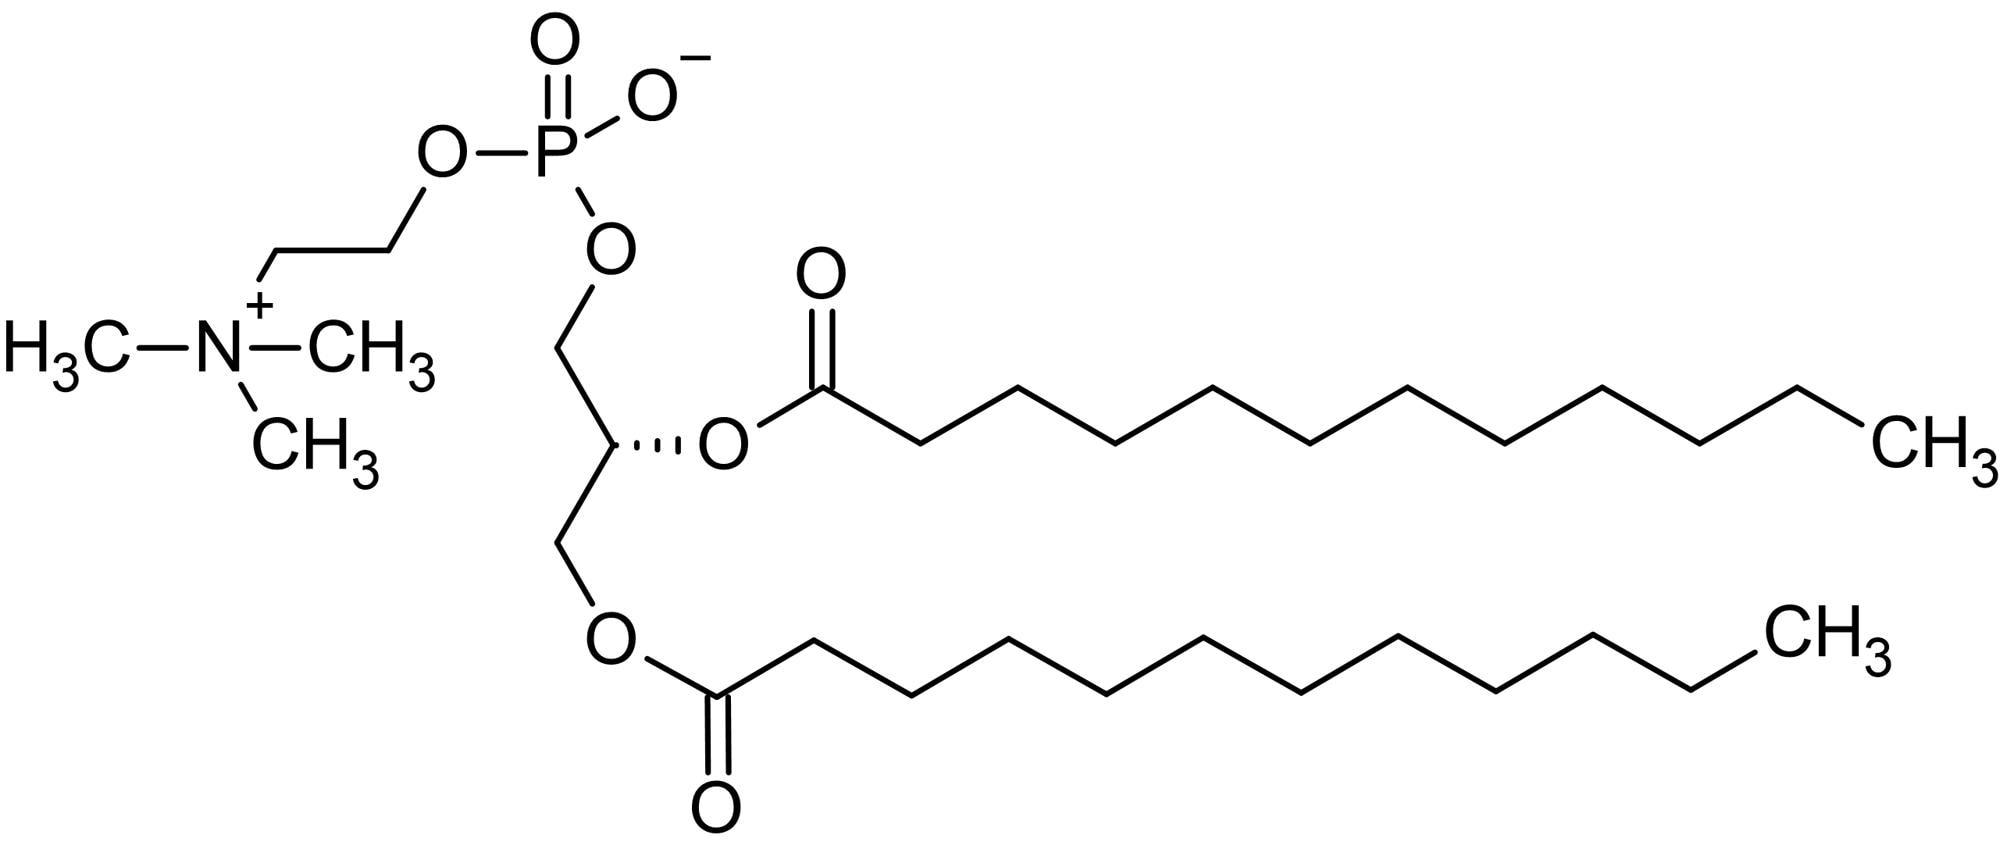 Chemical Structure - 1,2-Dilauroyl-sn-glycero-3-phosphorylcholine (DLPC), Phosphatidylcholine (ab143960)